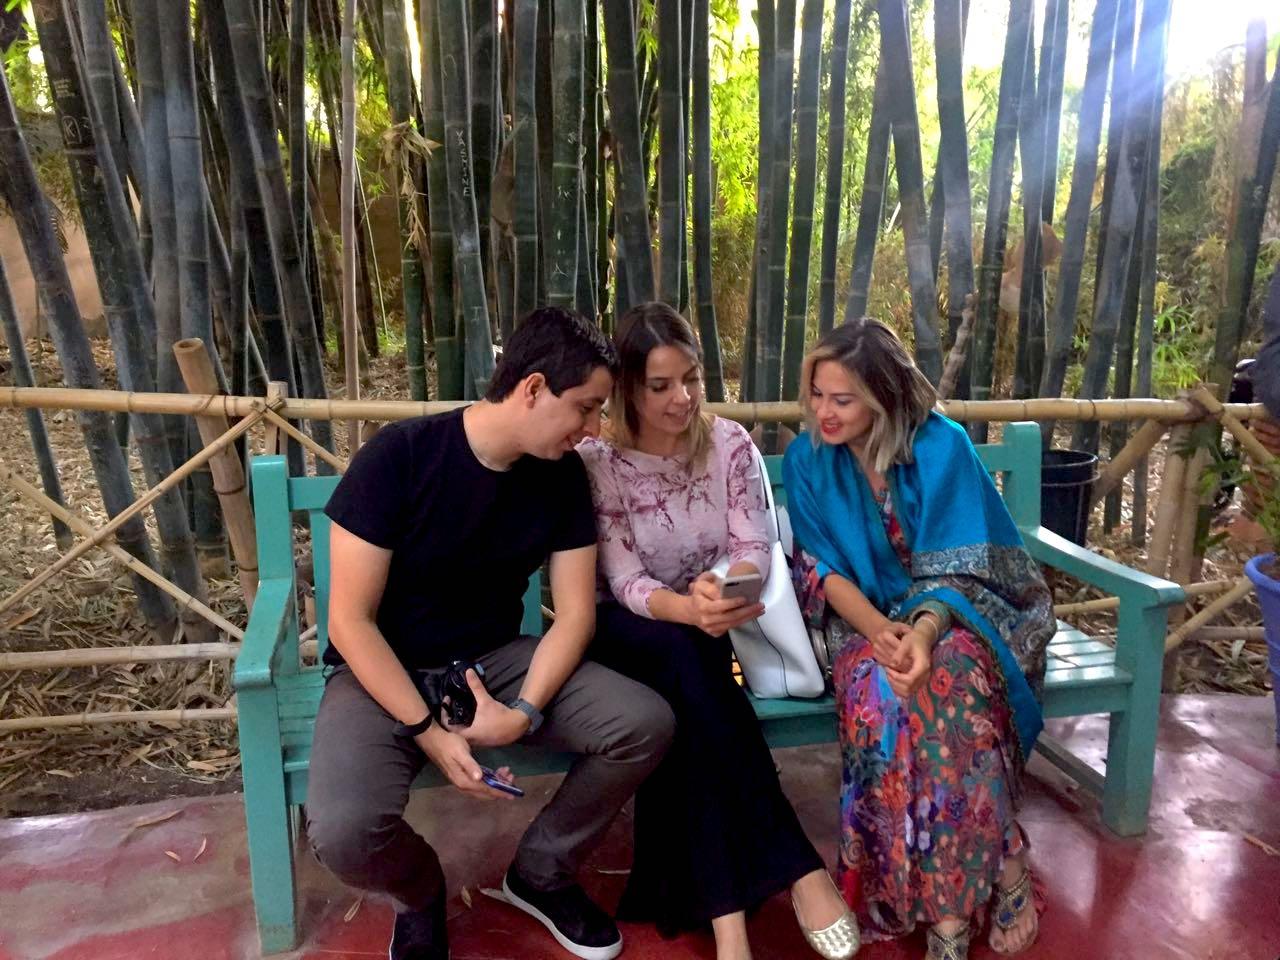 Renan Santana, Taylise Fernandes, e Camila Maciel curtem a atmosfera do jardim